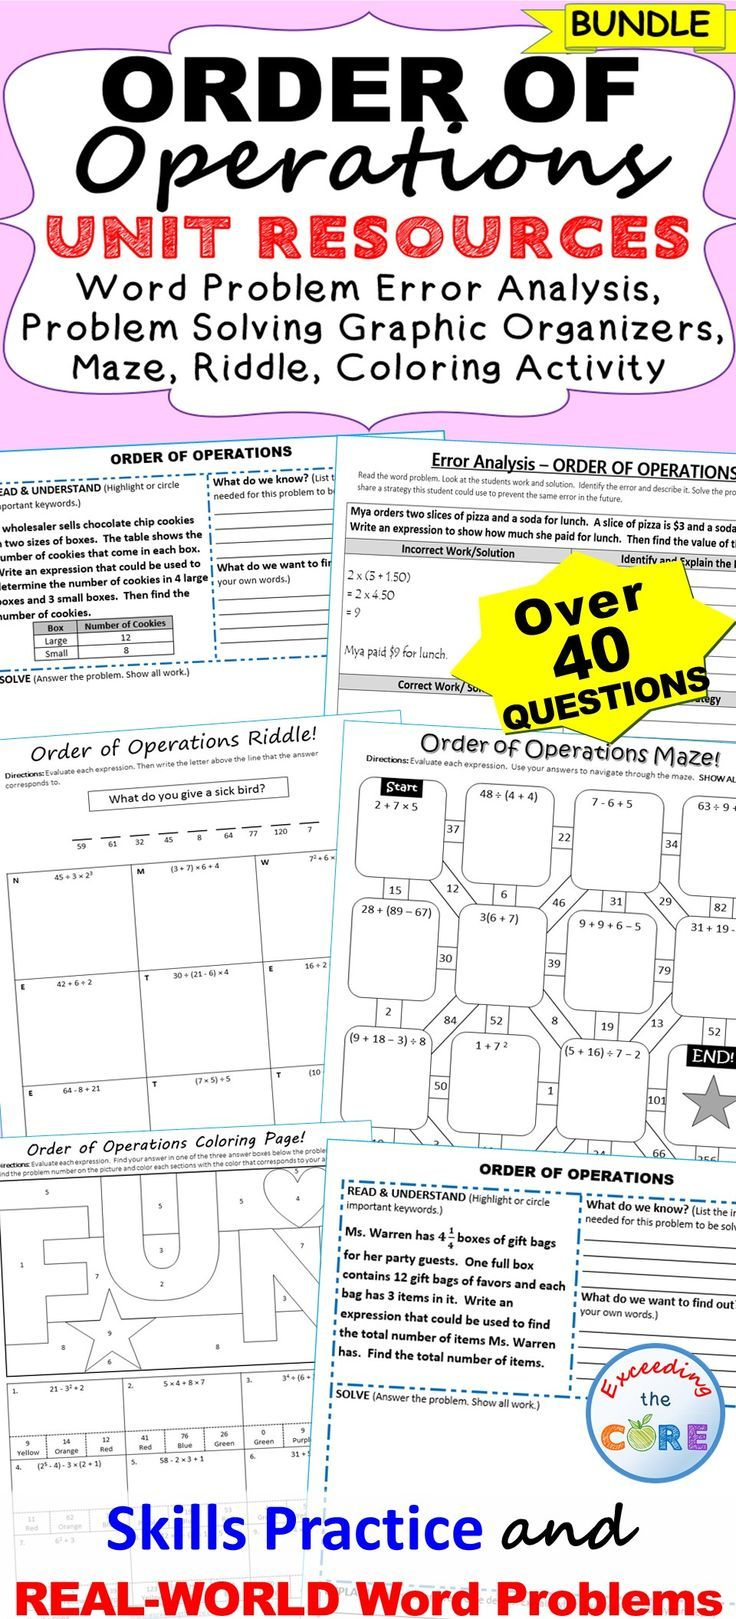 ORDER OF OPERATIONS Bundle Error Analysis, Task Cards